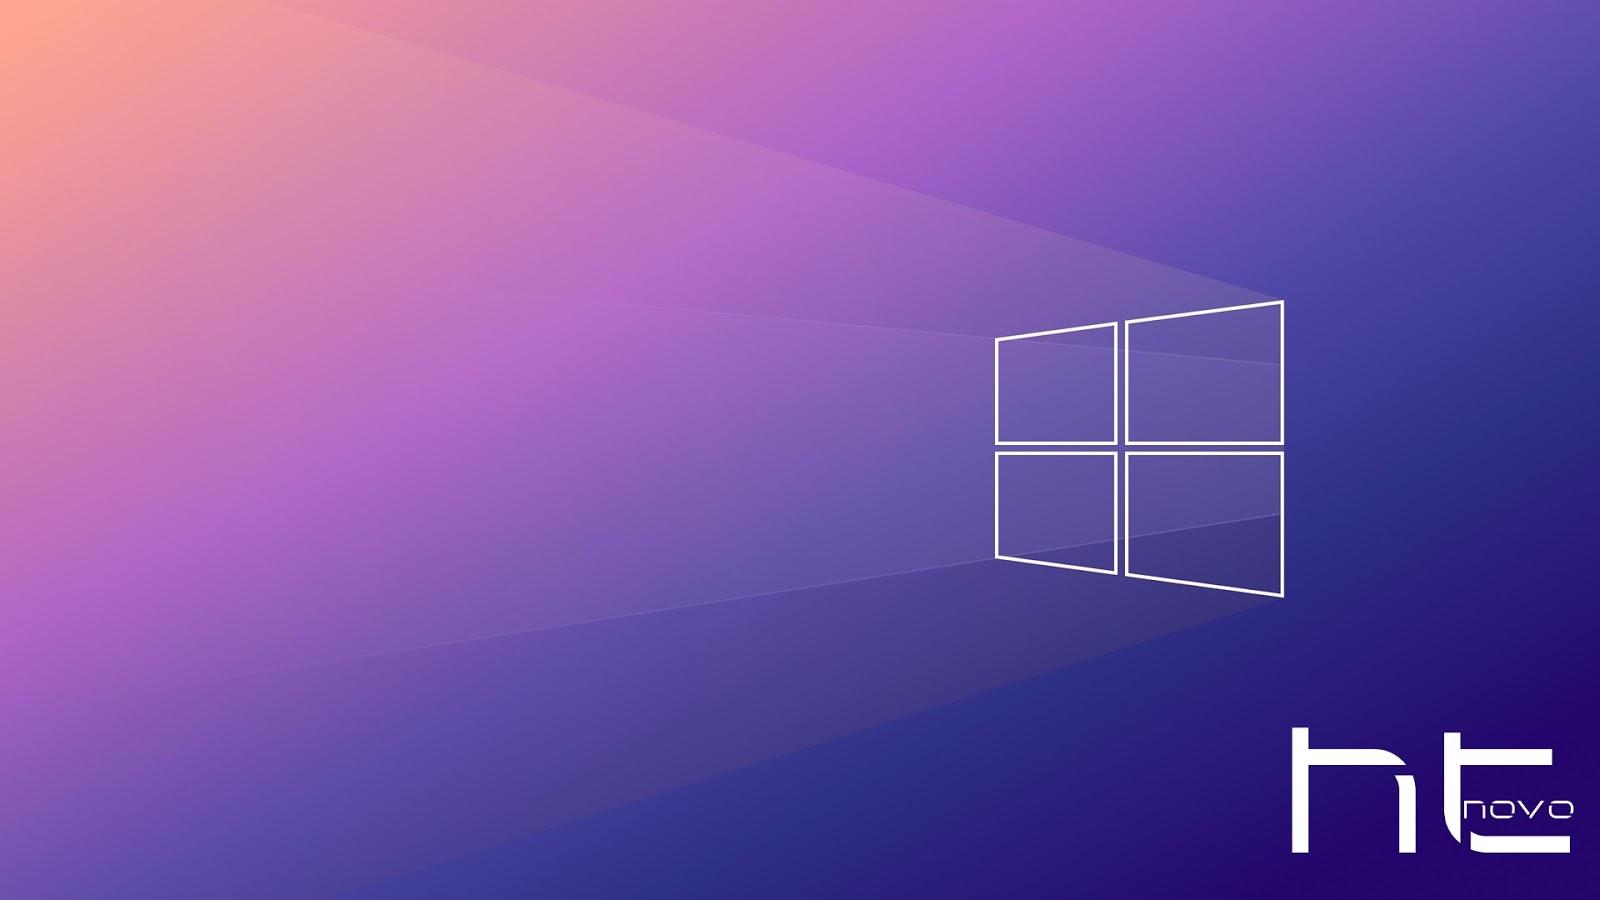 [May 2020 Update] Windows 10 Versione 2004 disponibile per tutti